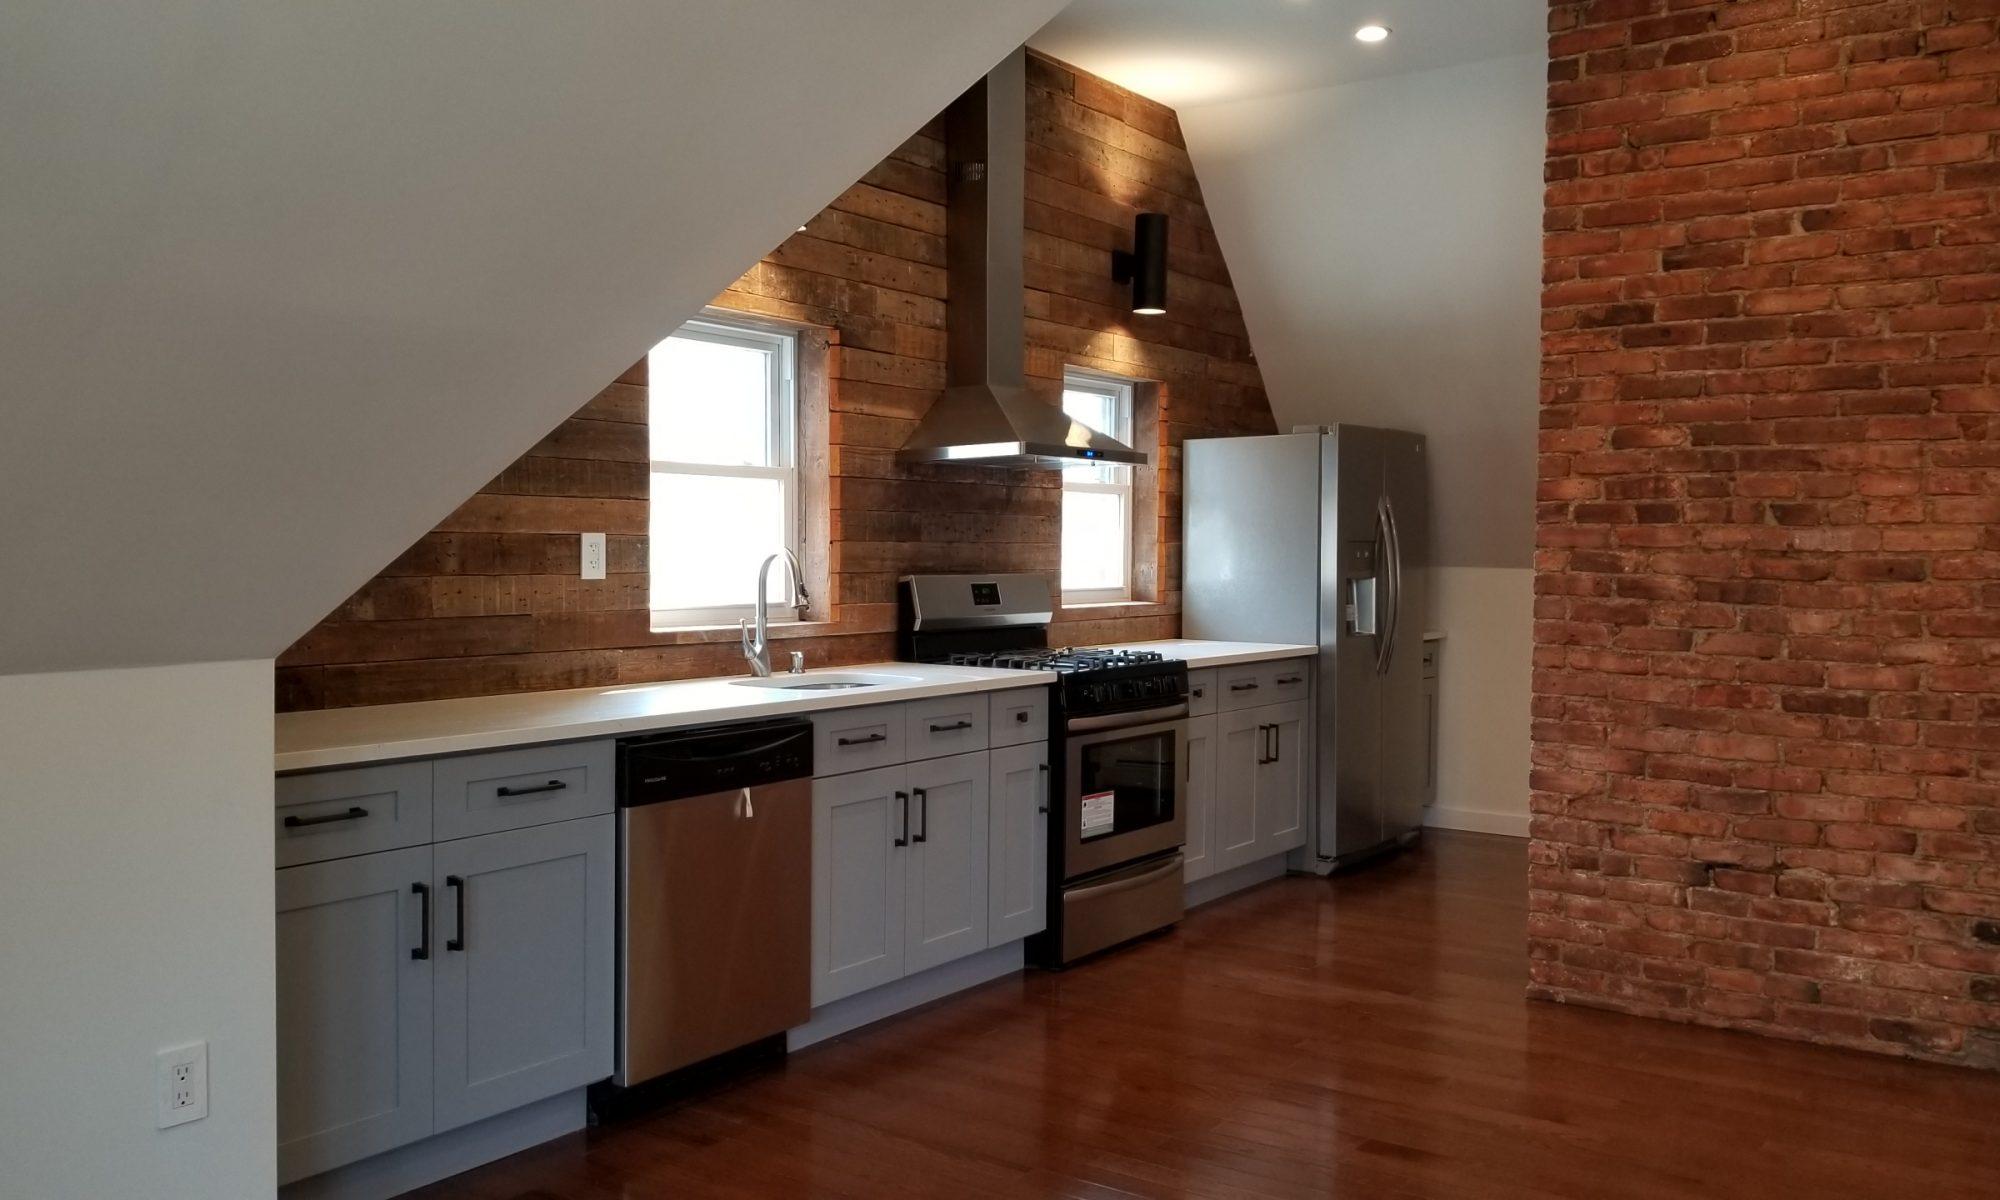 home | beyond designs & remodeling